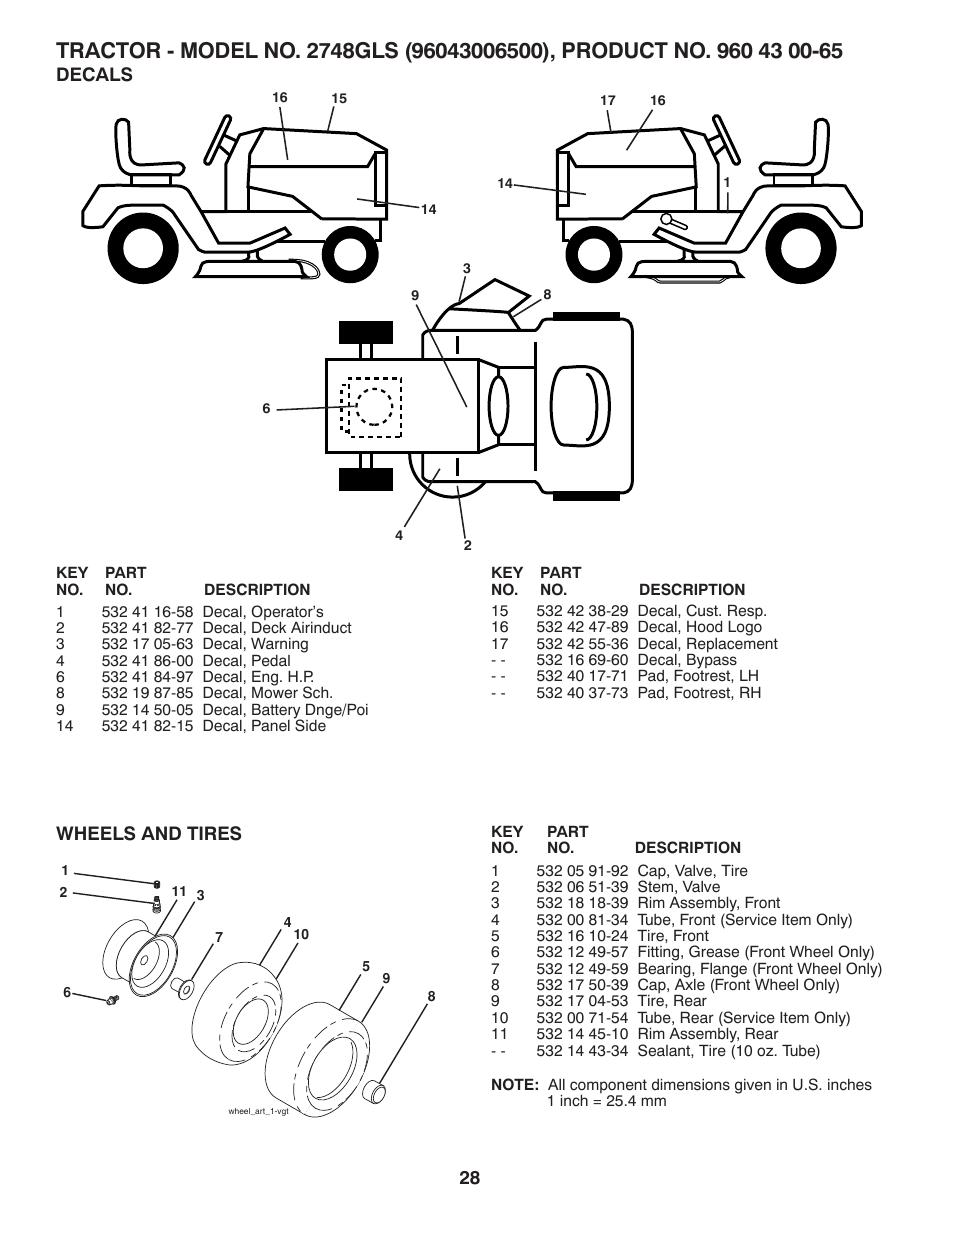 husqvarna royal 50se operator u0027s manual Array - repair parts decals  wheels u0026 tires husqvarna 2748 gls user rh manualsdir com